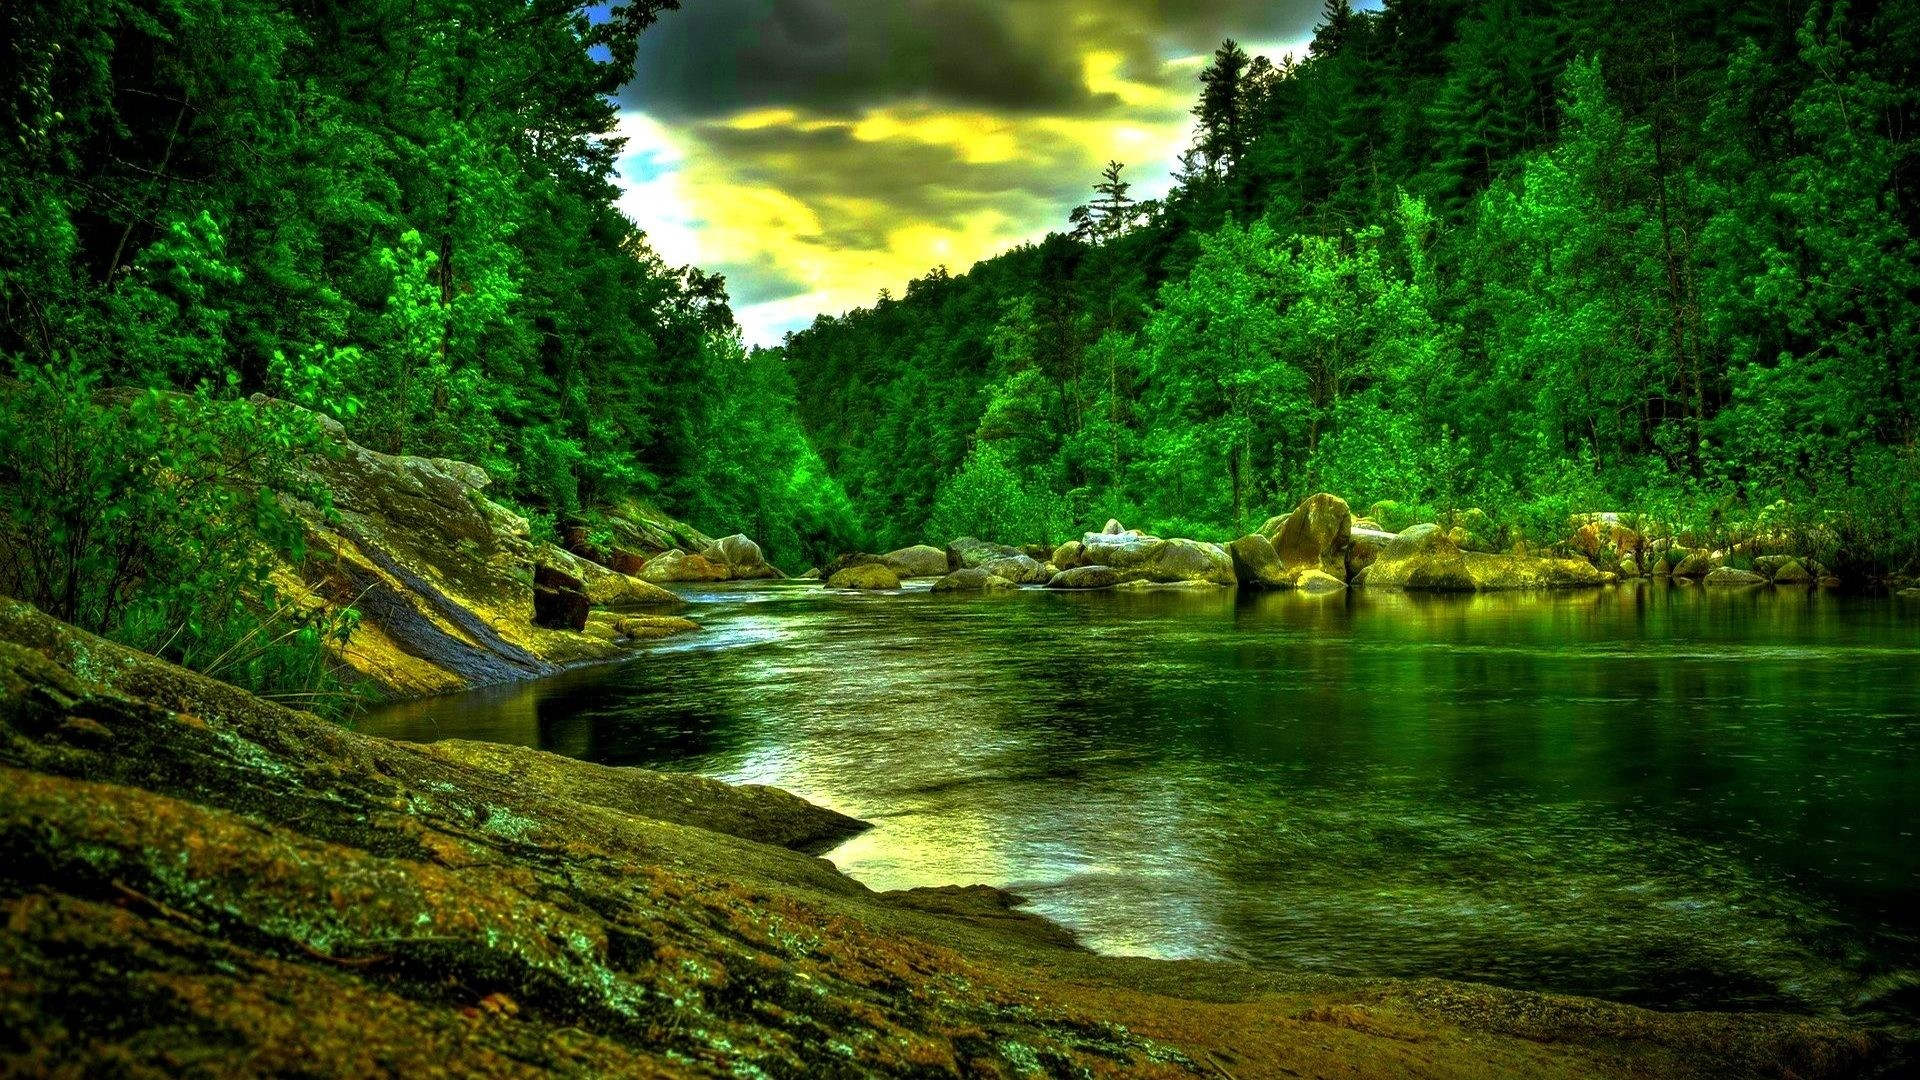 Amazon Desktop Wallpaper 3d Nature Full Screen. 1920×1200. Amazon Tag –  Amazon Free Nature Desktop Images for HD 16:9 High Definition 1080p